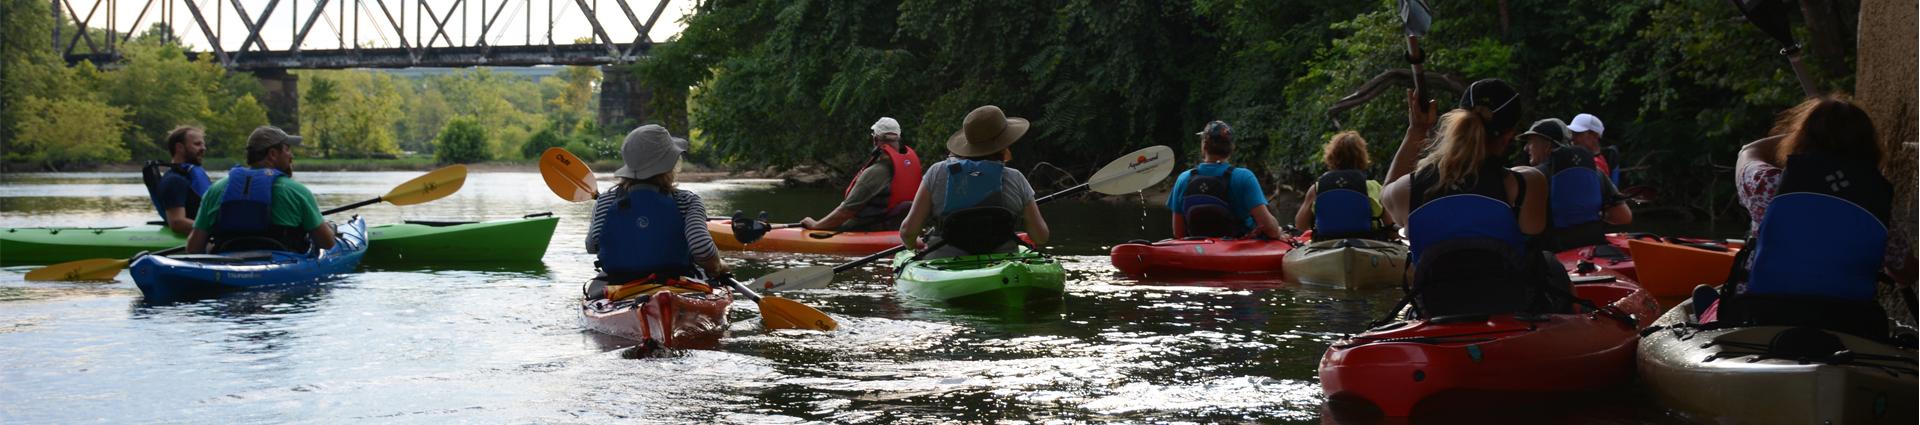 kayakers-1